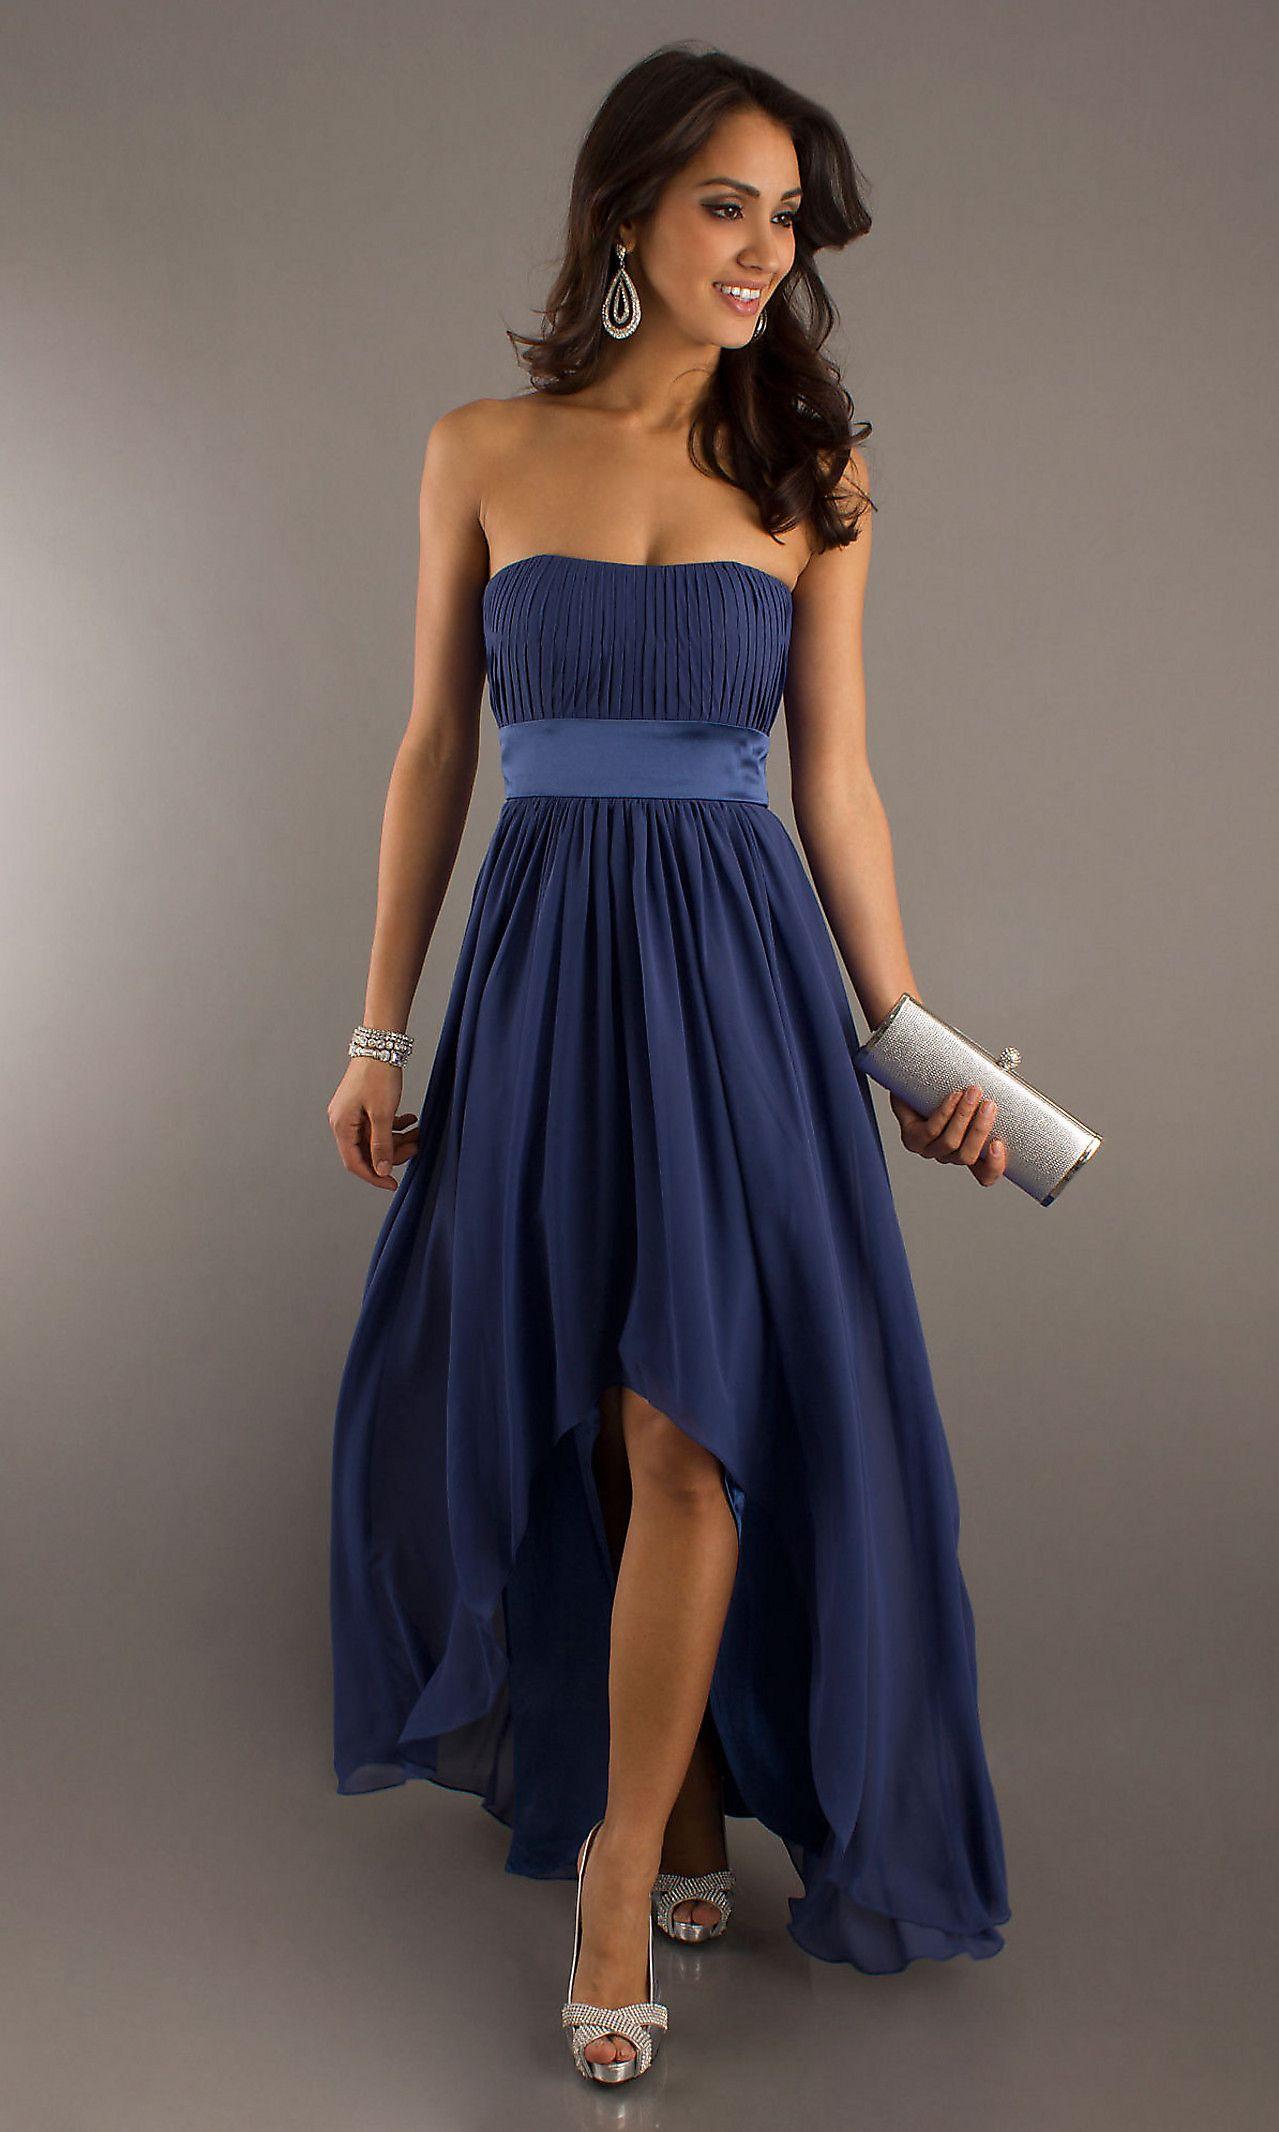 Strapless hi low prom dresses bridesmaid dress simply dresses